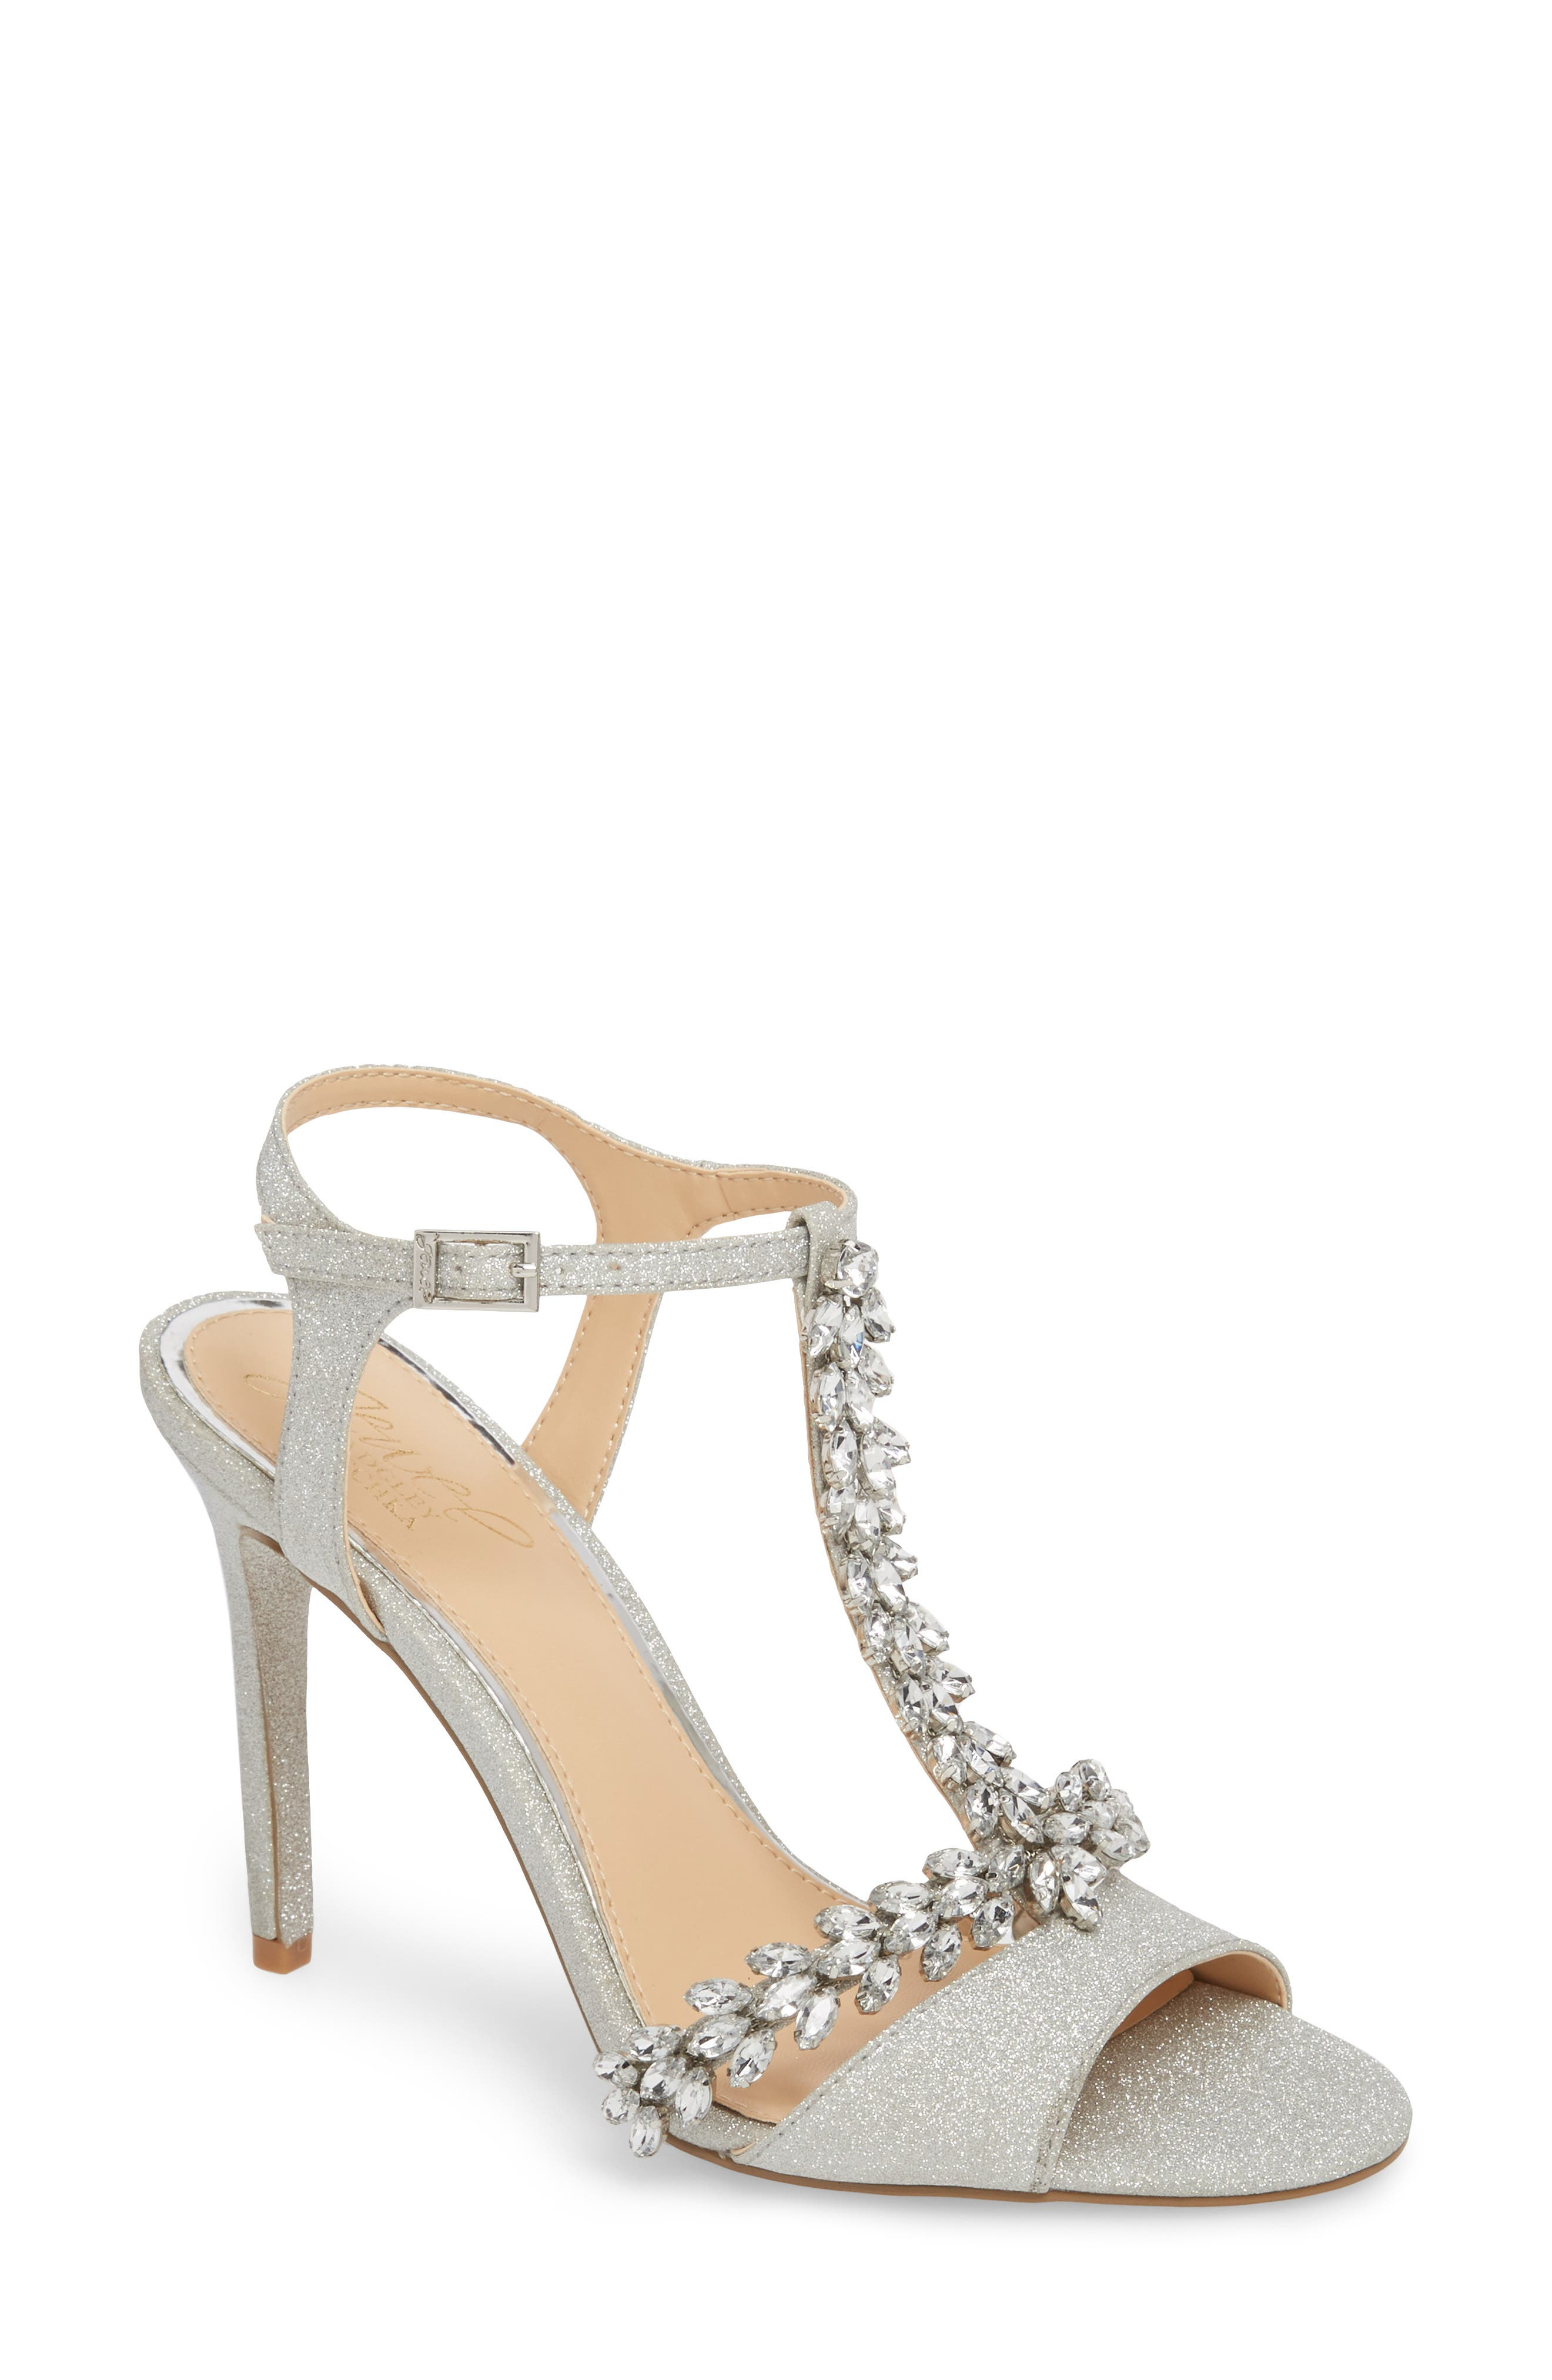 JEWEL BADGLEY MISCHKA Maxi Crystal Embellished Sandal, Main, color, SILVER GLITTER FABRIC